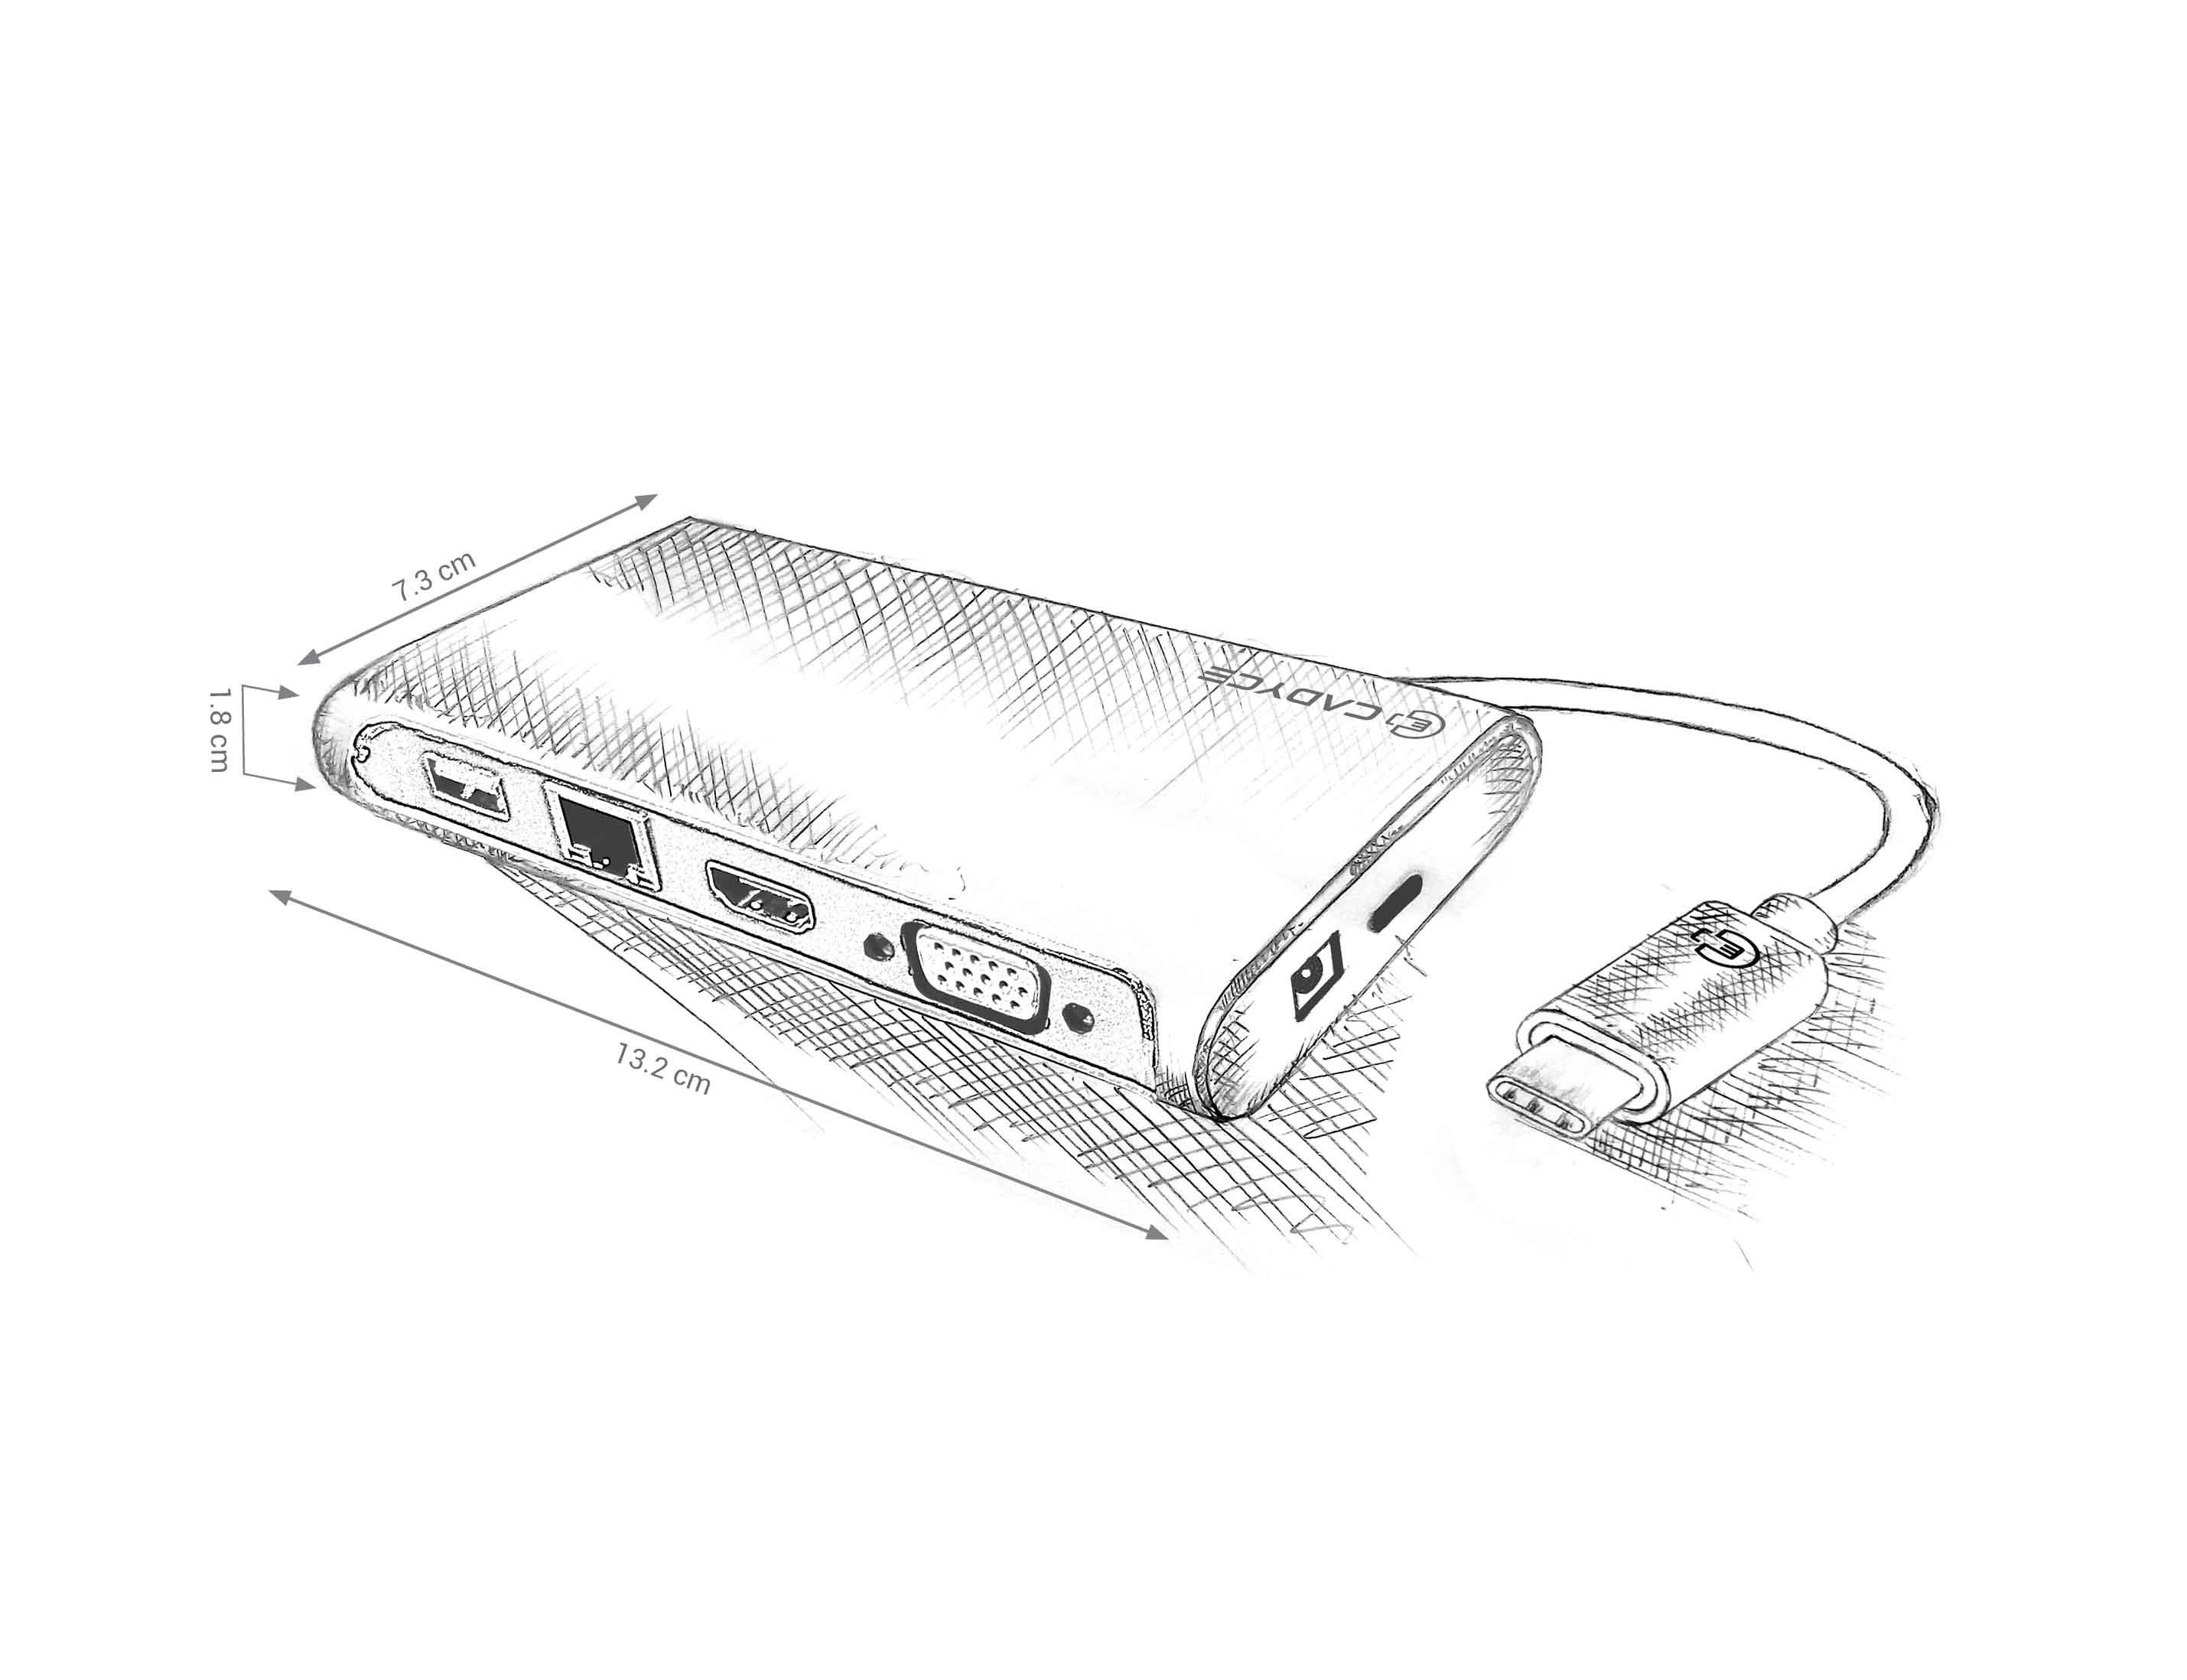 2859x2196 Cadyce Announces Its New Portable Travel Dock, Cadyce Ca C3tds